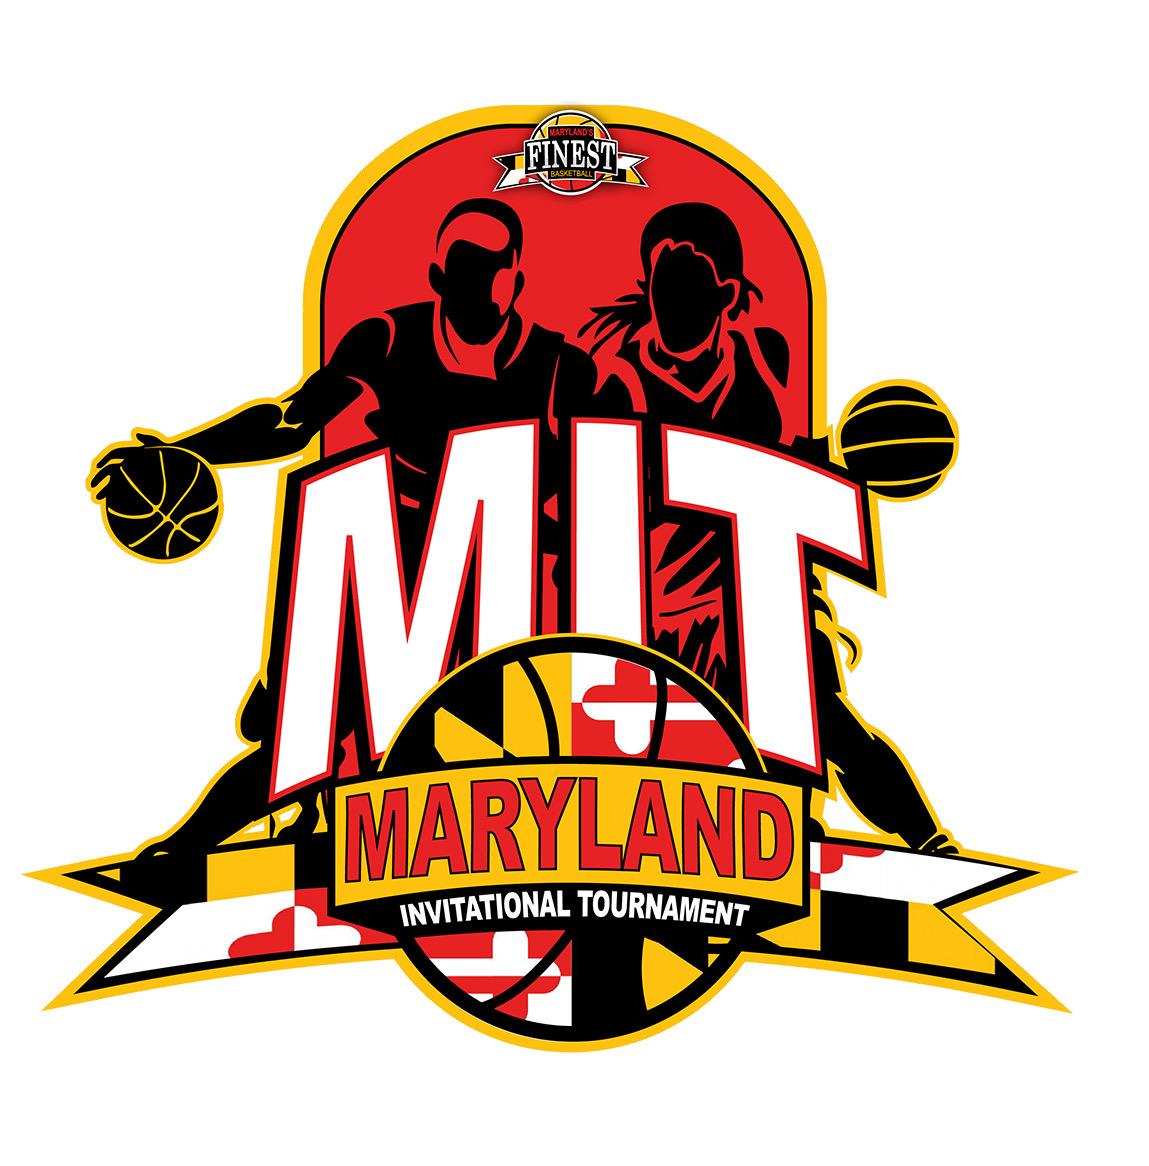 Maryland Invitational Tournament (MIT)